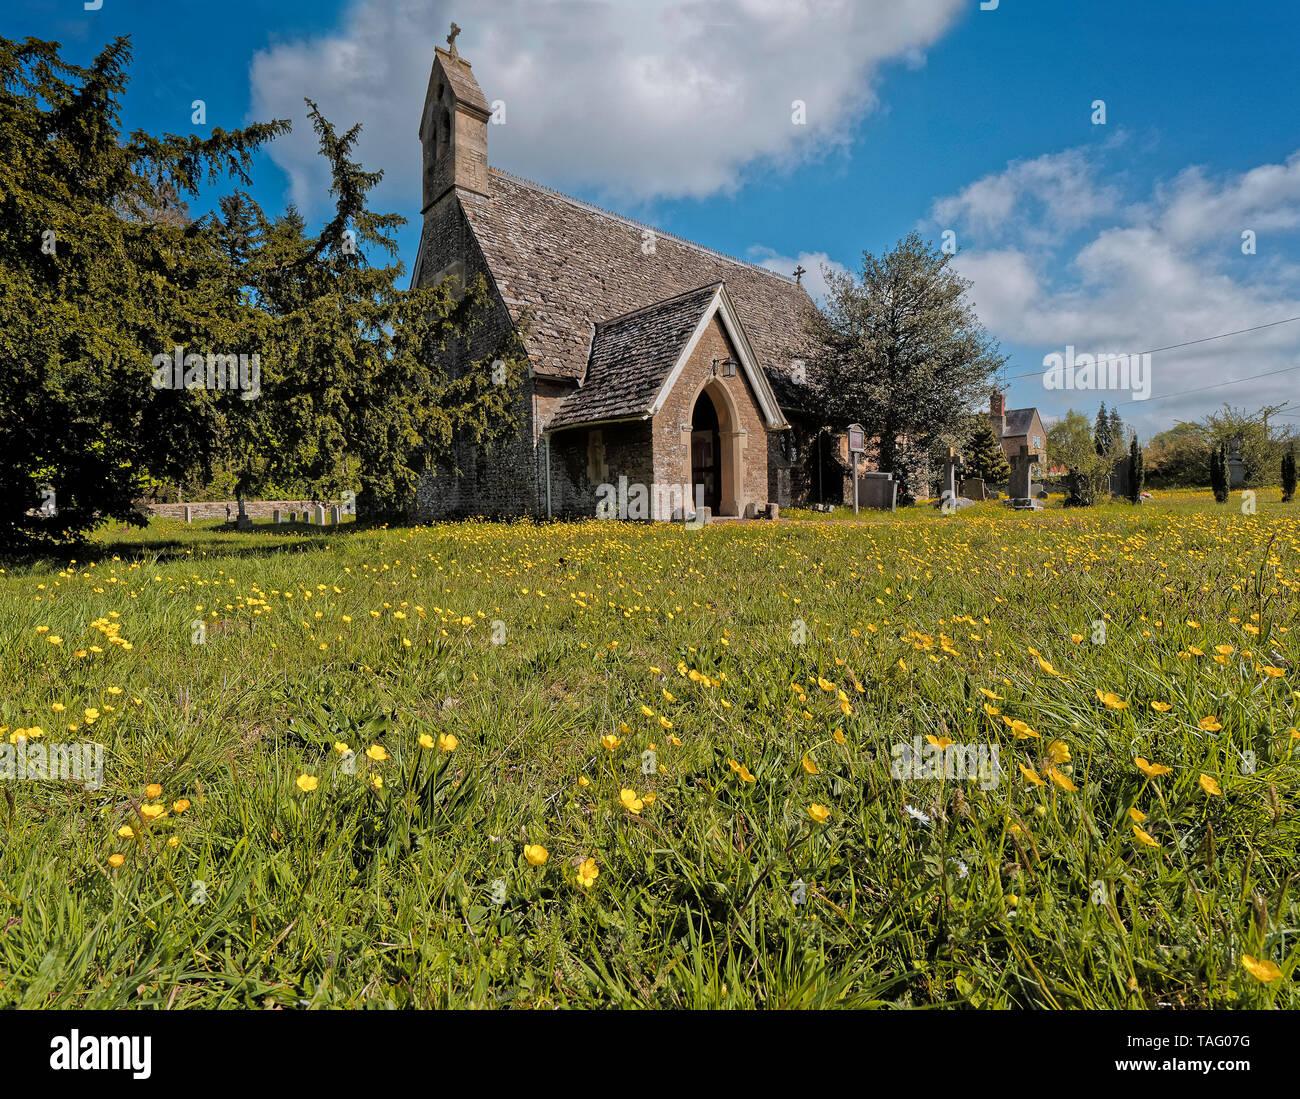 Exterior of St Lawrence Church, Tubney, Oxfordshire, UK - Stock Image